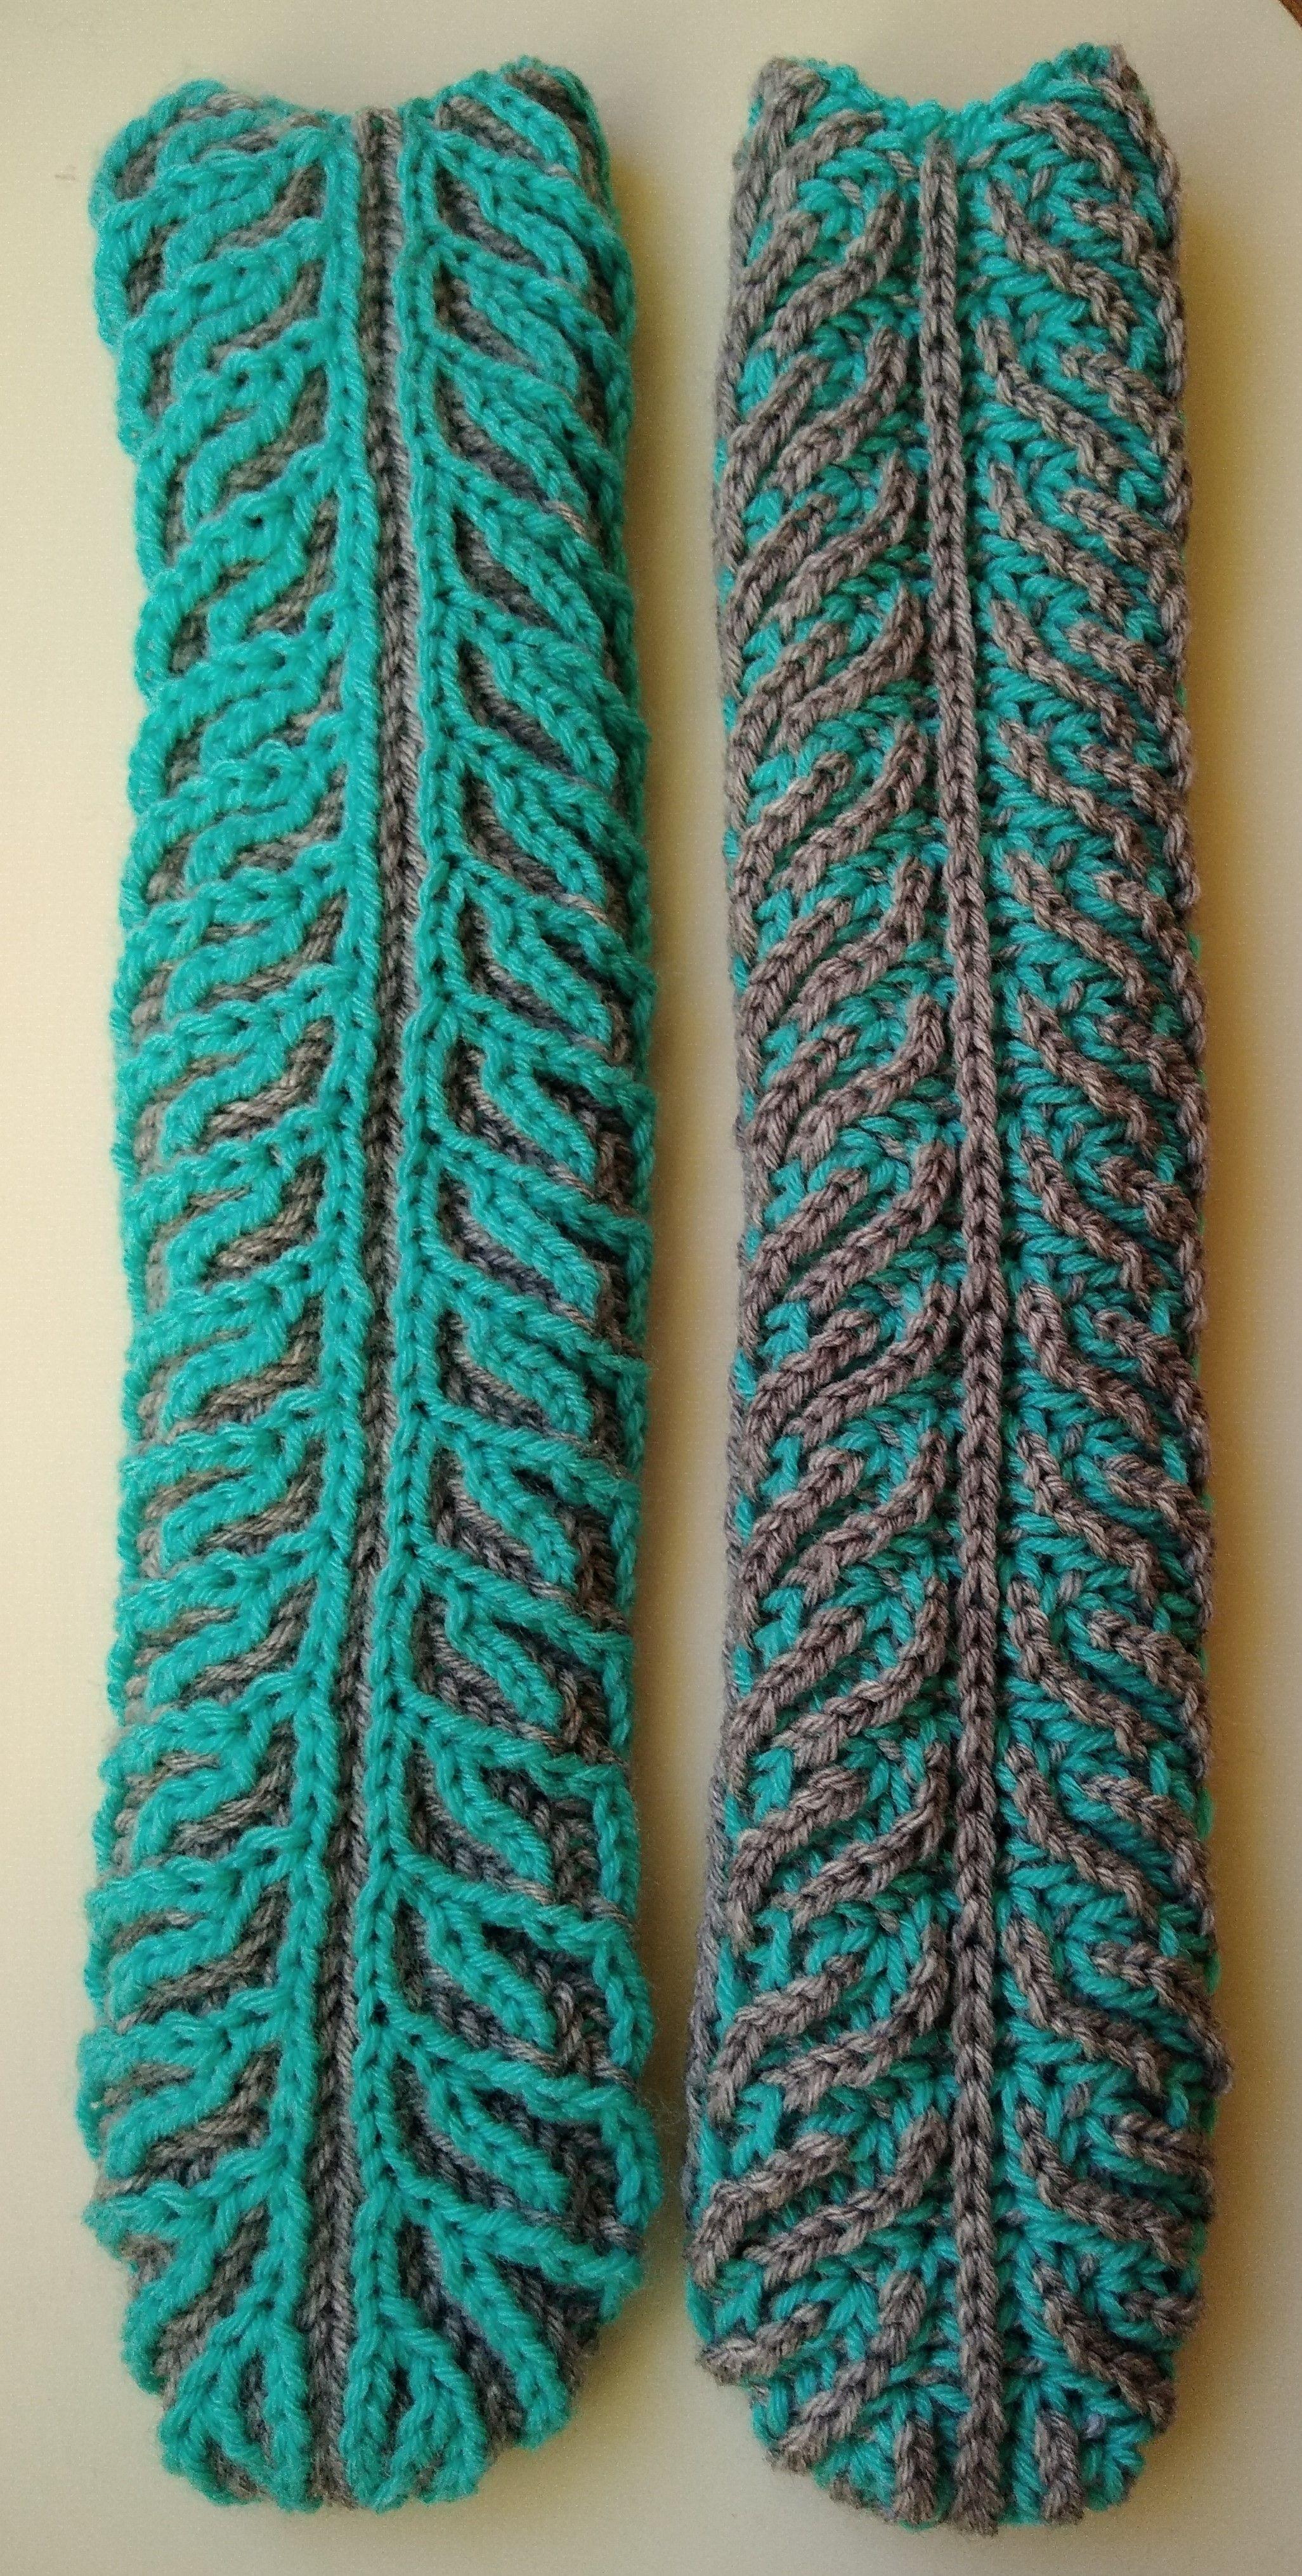 Brioche tube socks (braid) Construction: in the round (magic loop ...